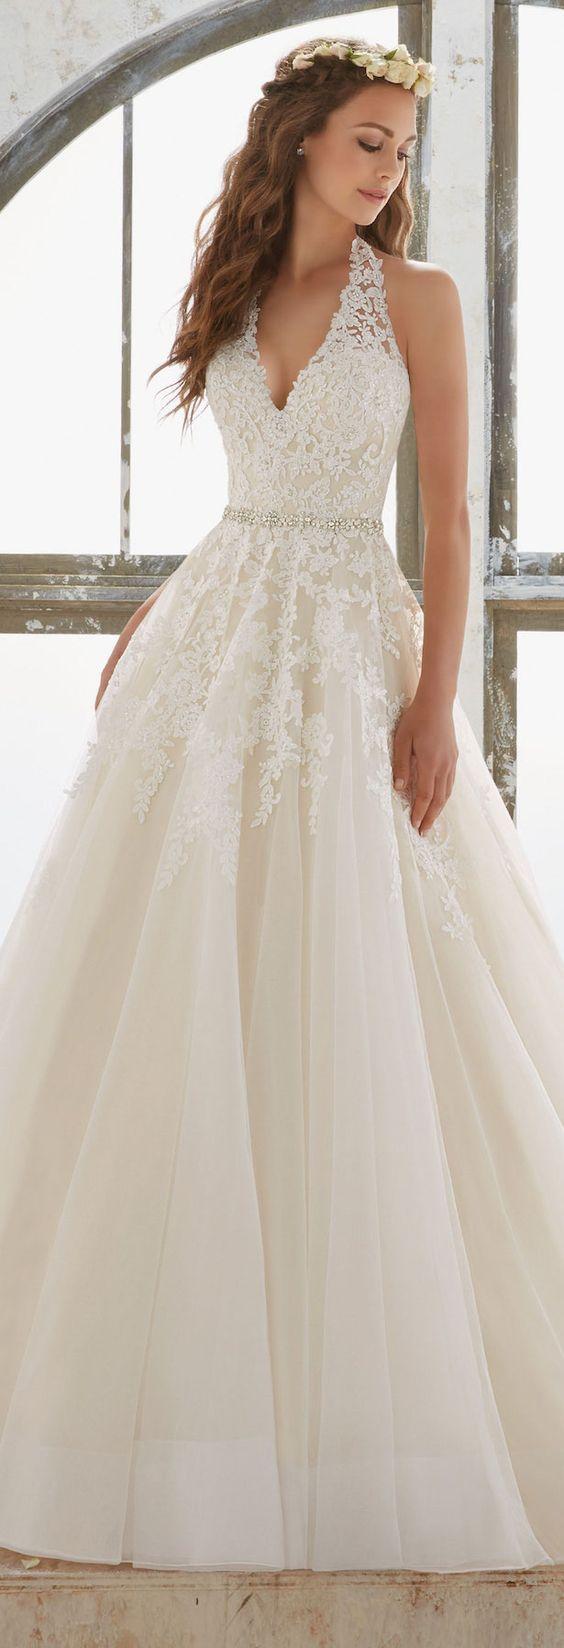 Wedding Dress Inspiration Mori Lee Mori lee wedding dresses